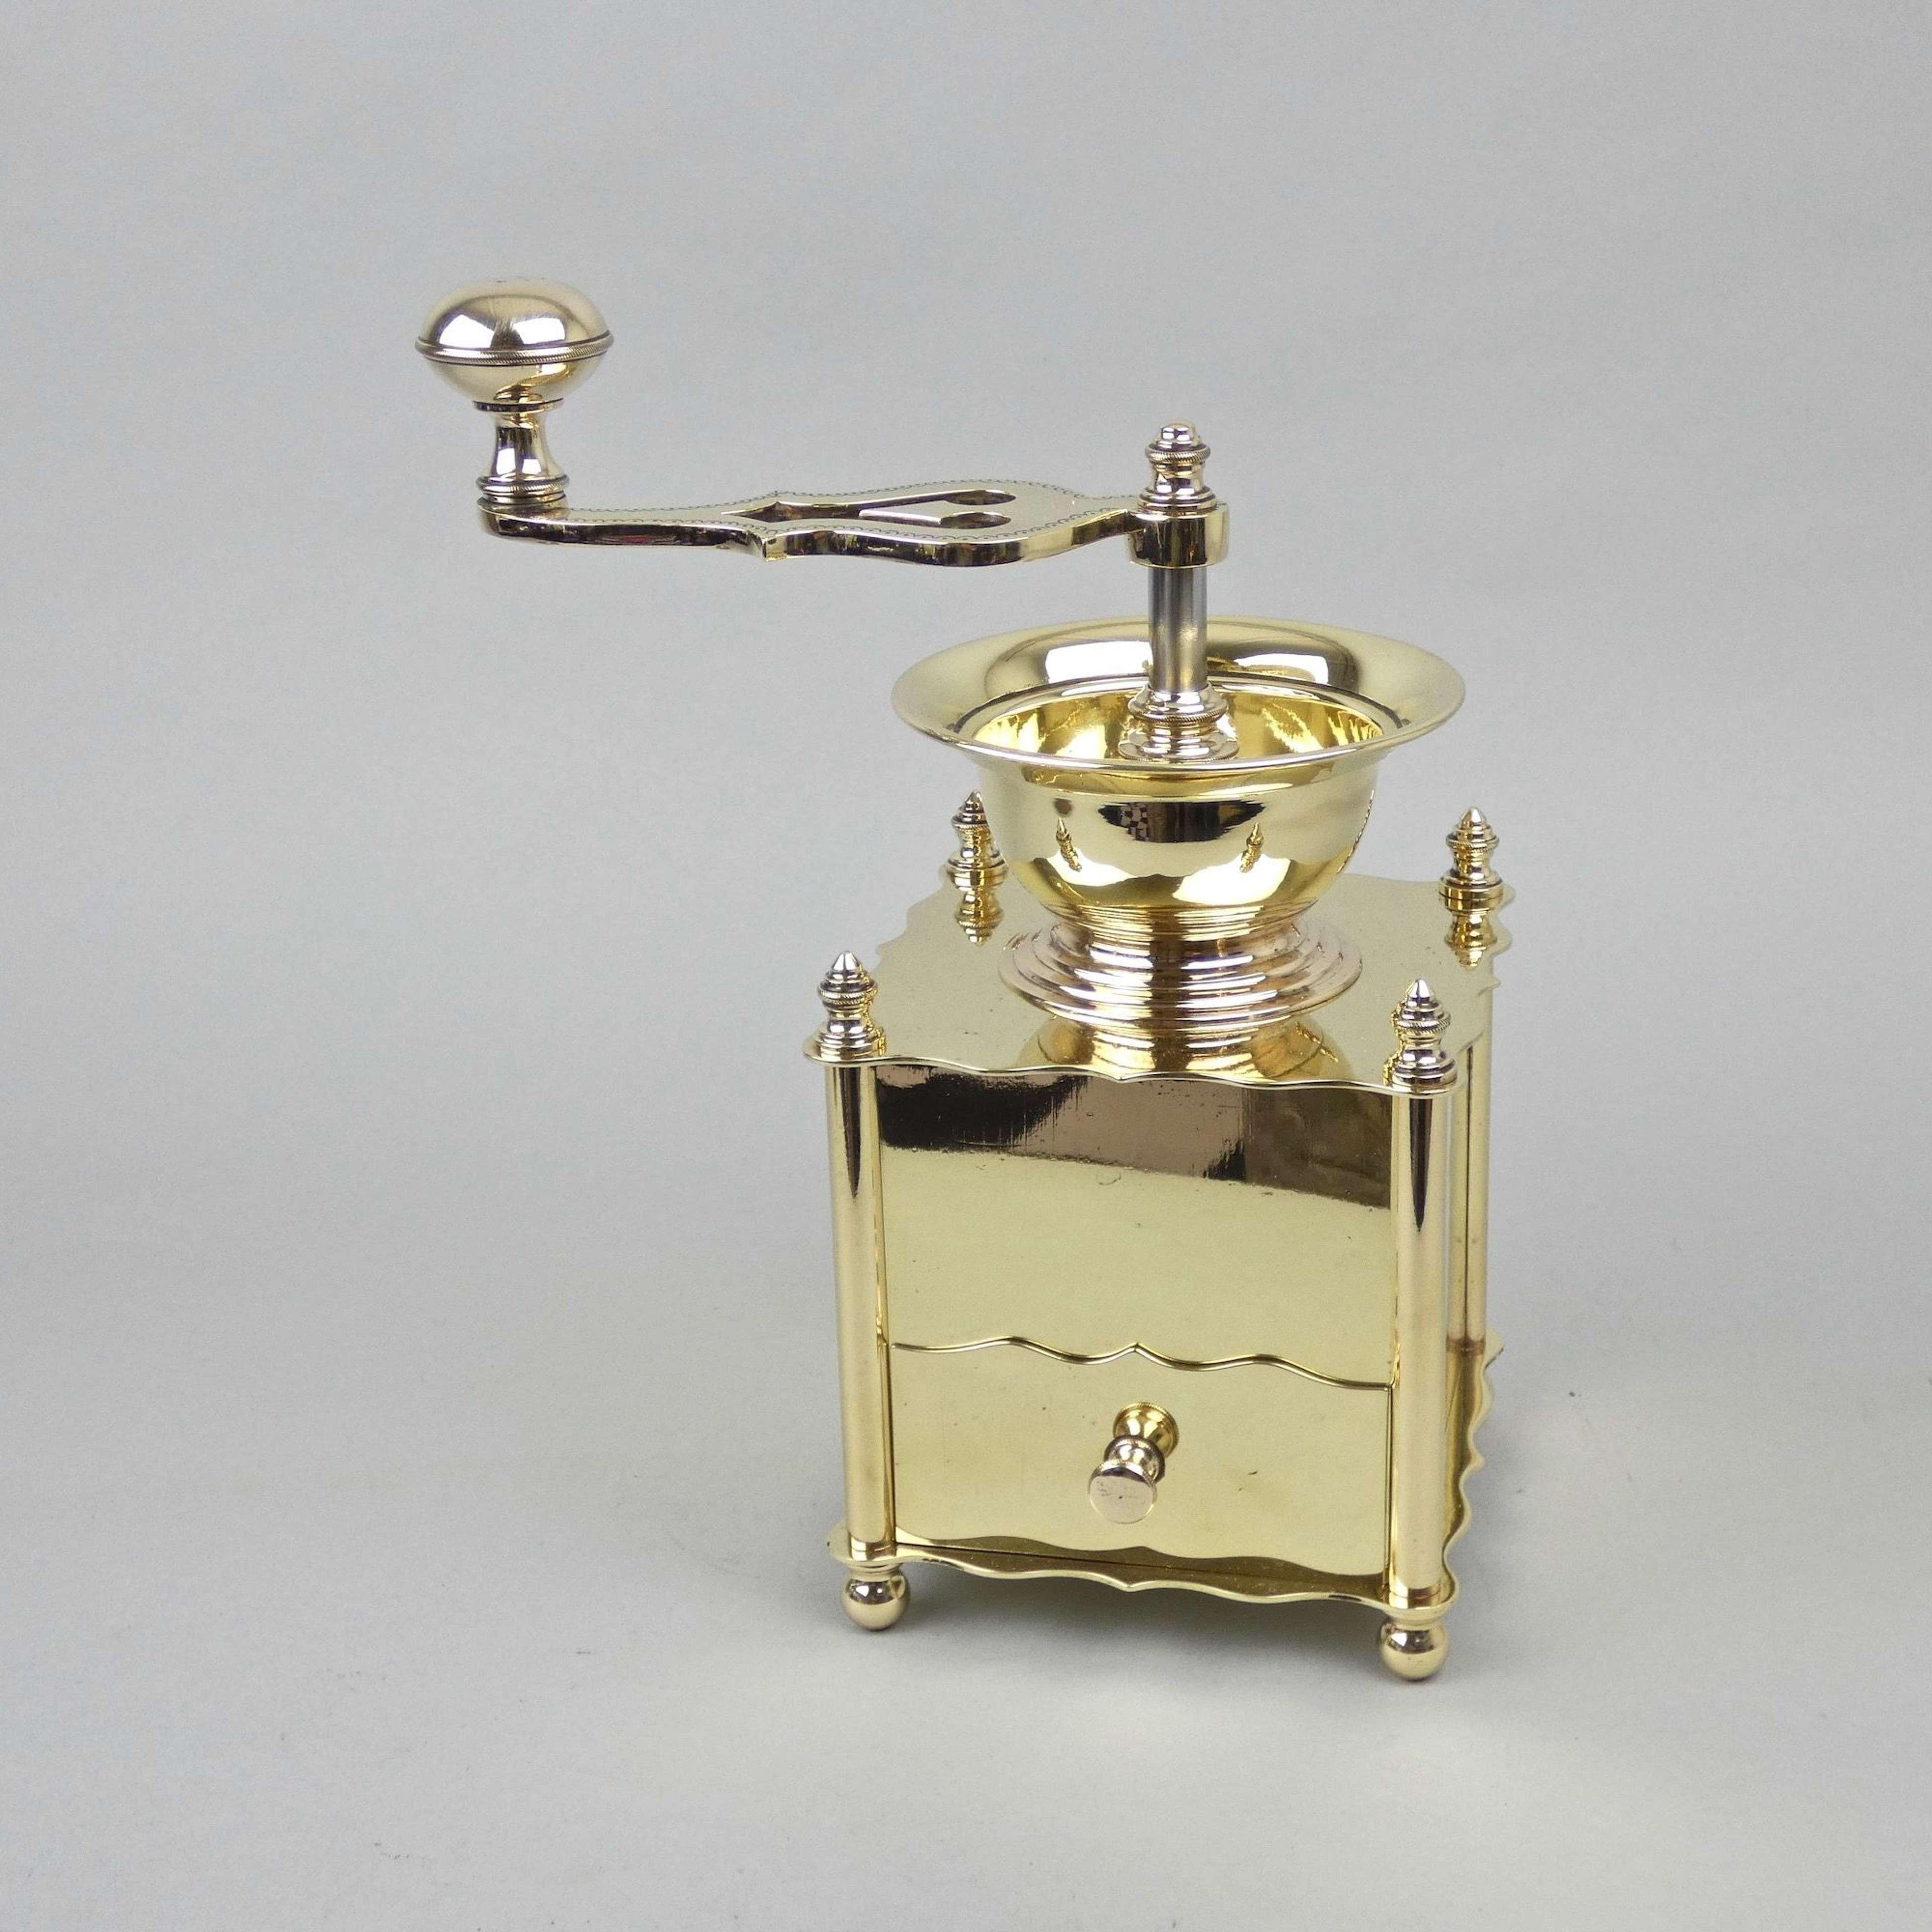 Brass coffee or pepper mill